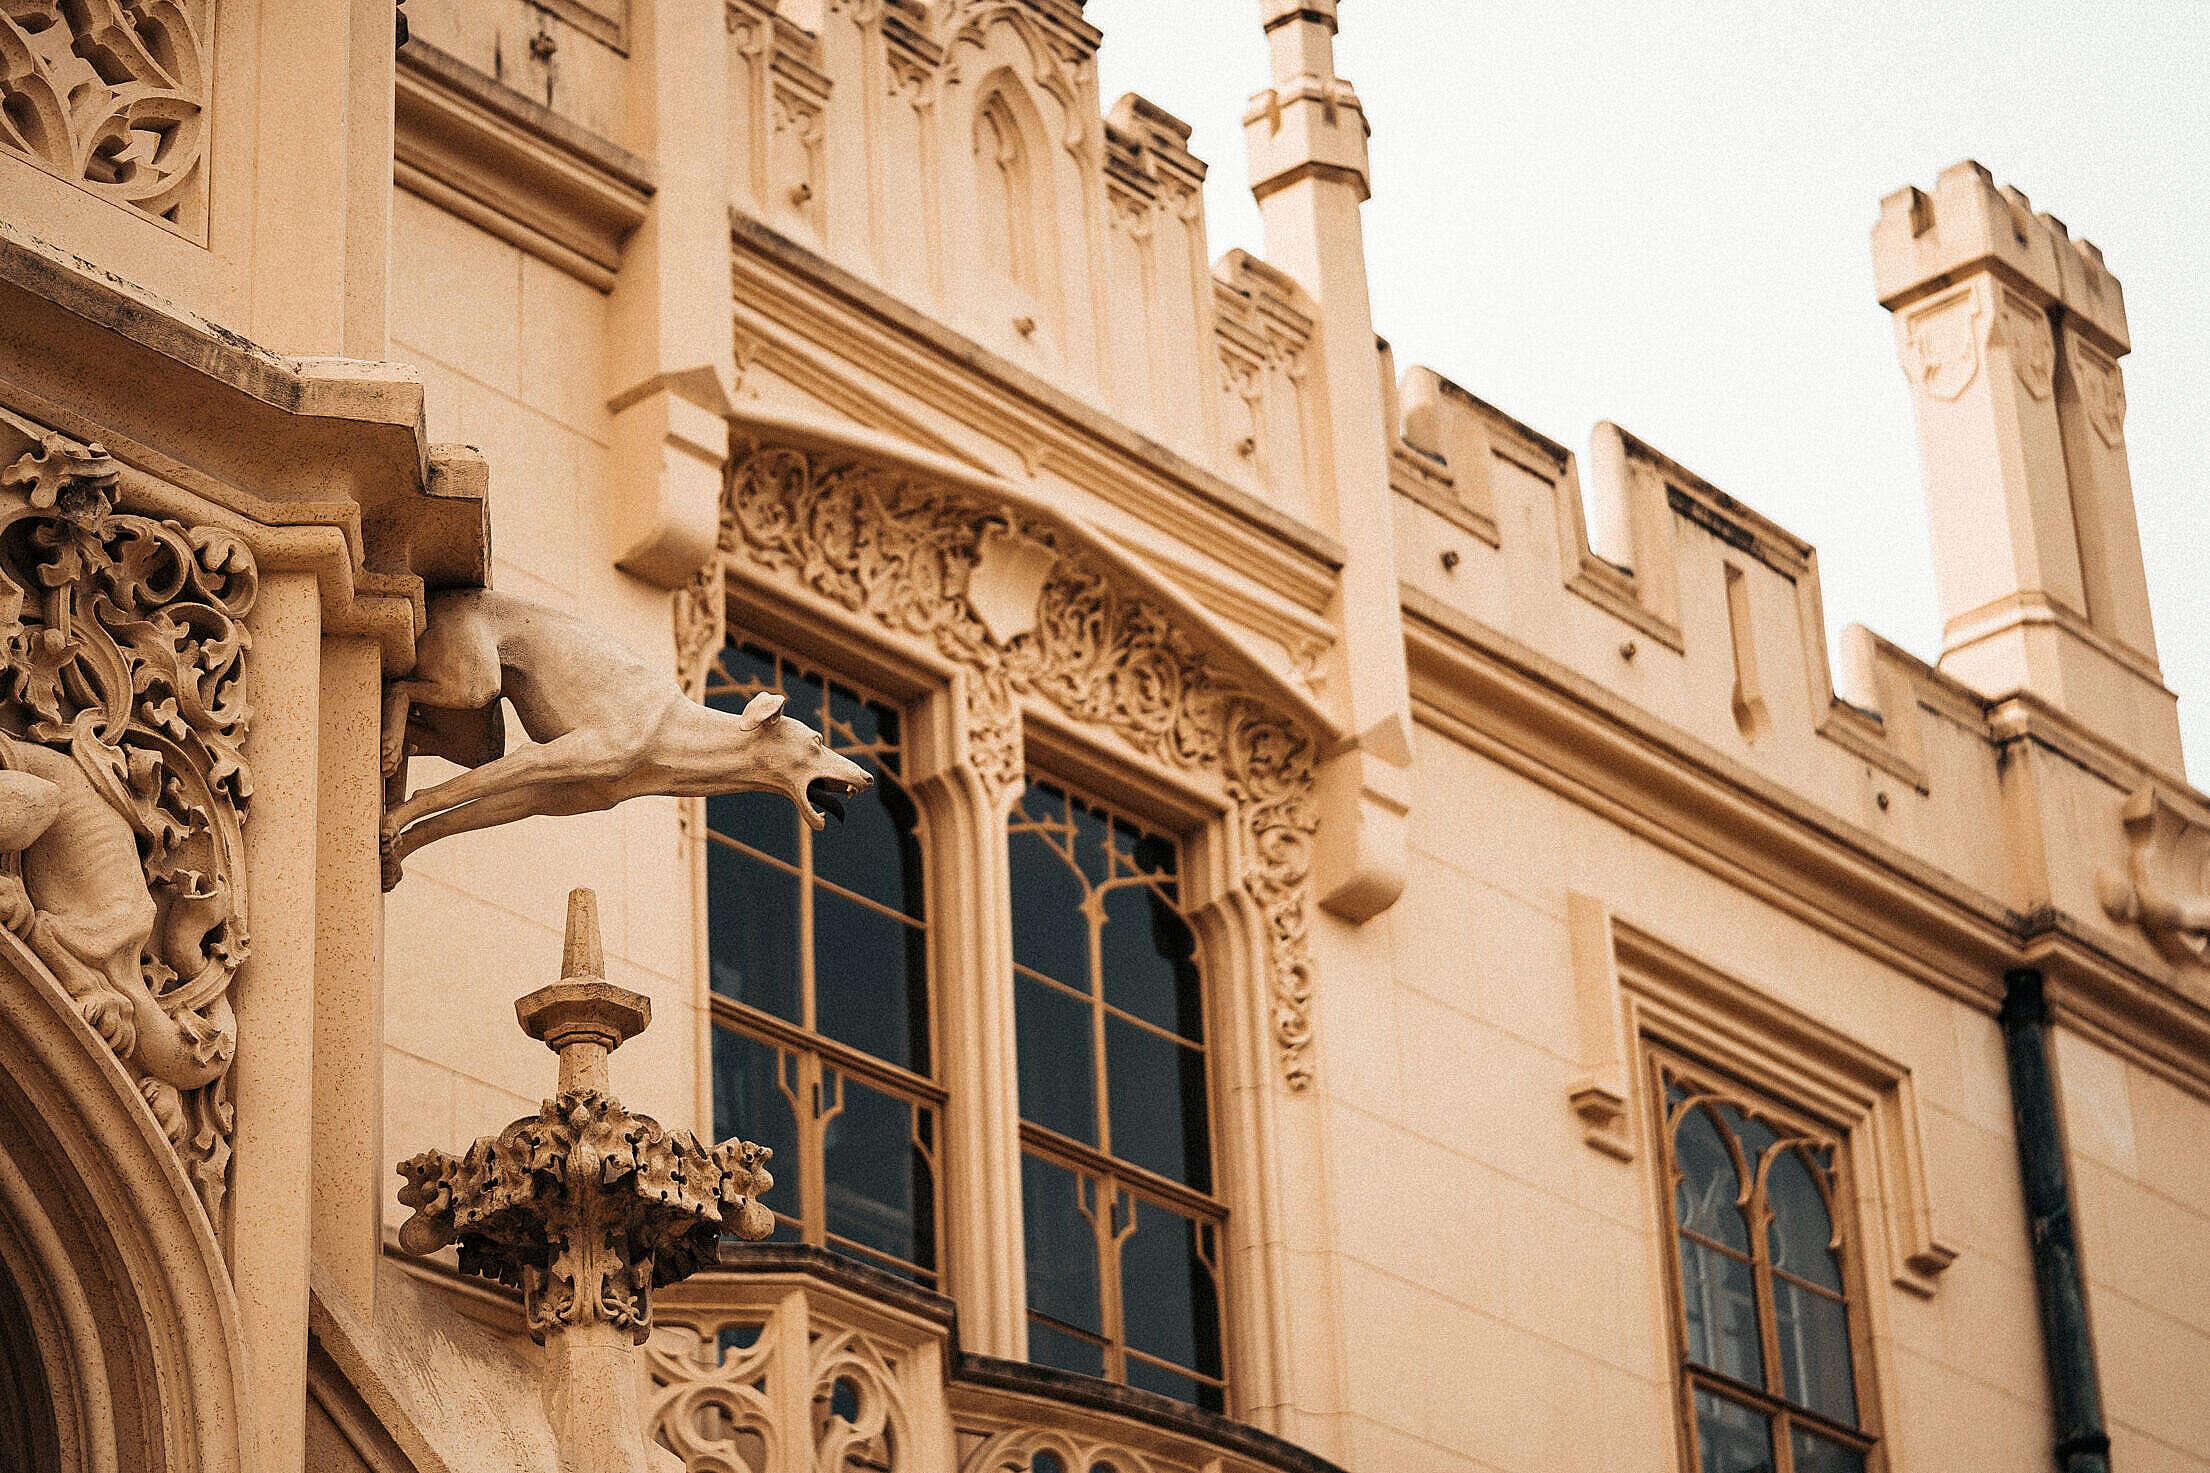 Architecture of Lednice Castle Free Stock Photo